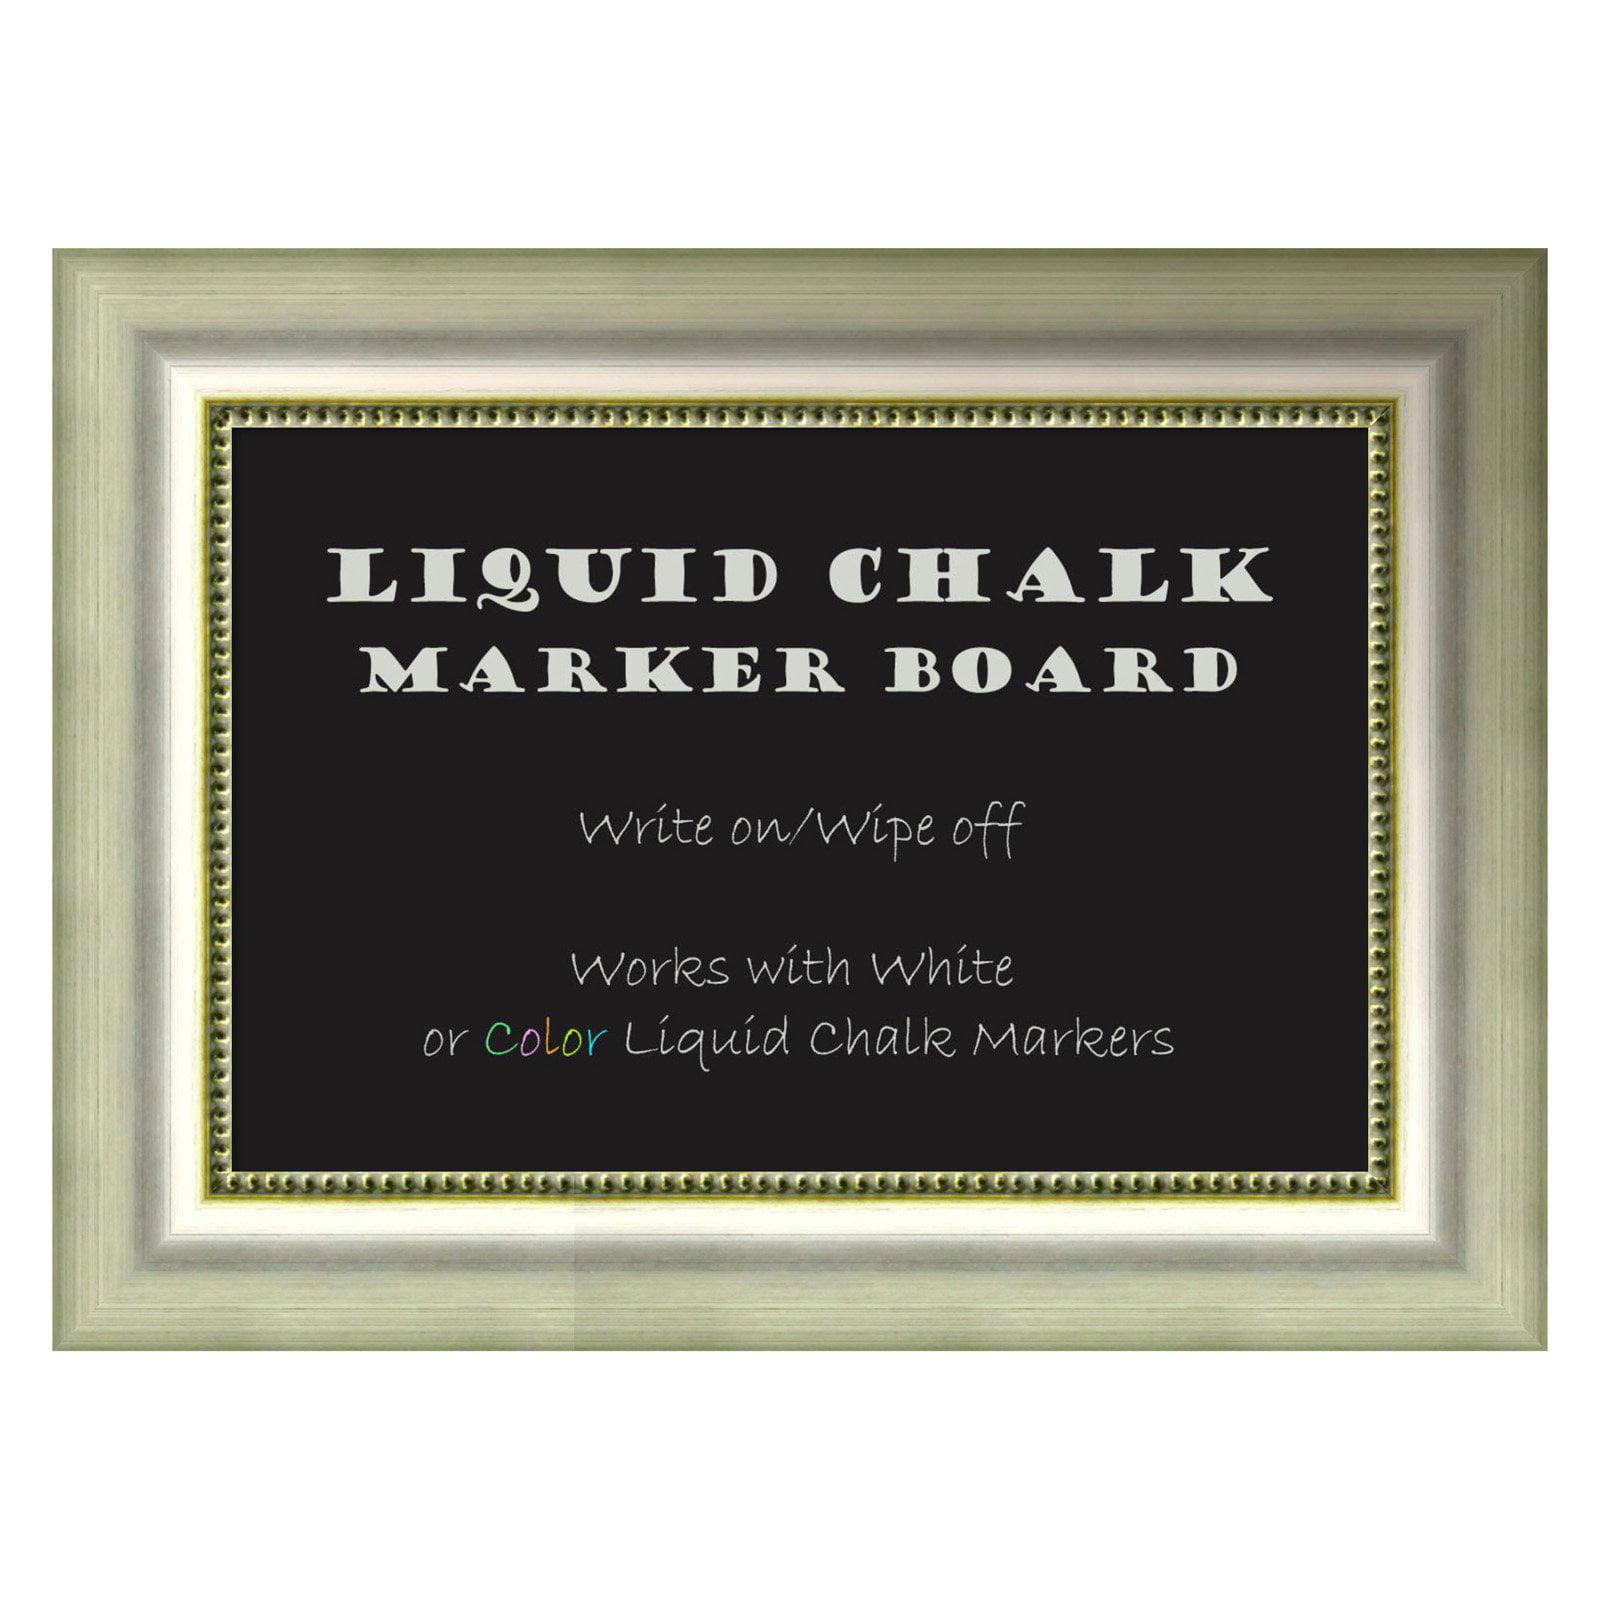 Amanti Art Vegas Burnished Silver Framed Liquid Chalk Marker Board